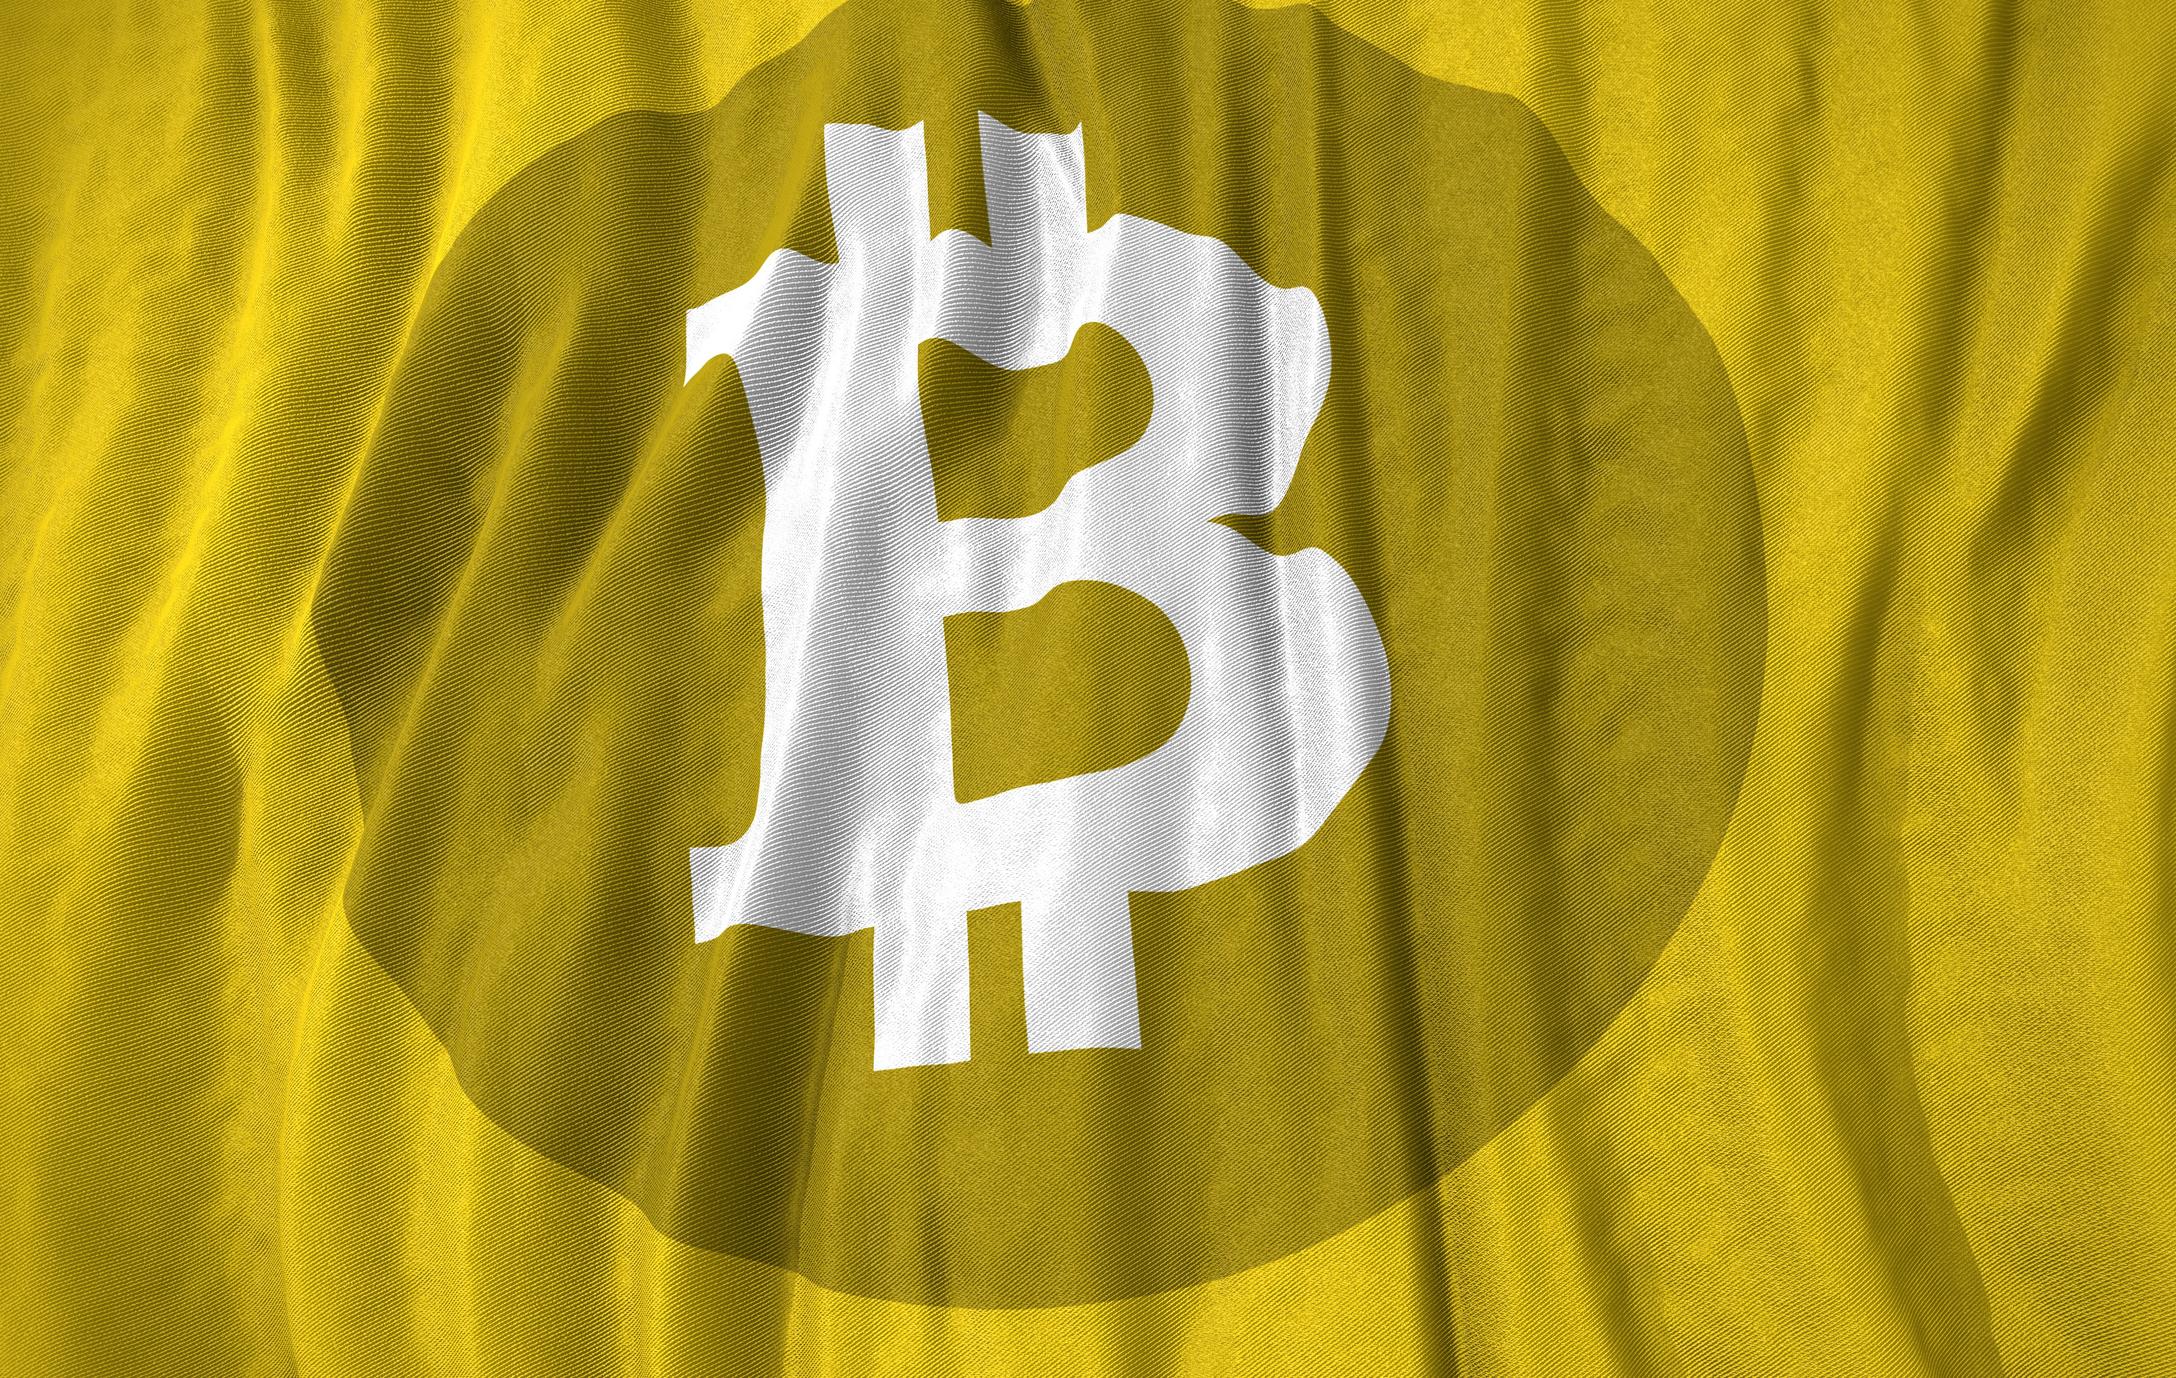 Bitcoin symbol on a yellow cloth backdrop.